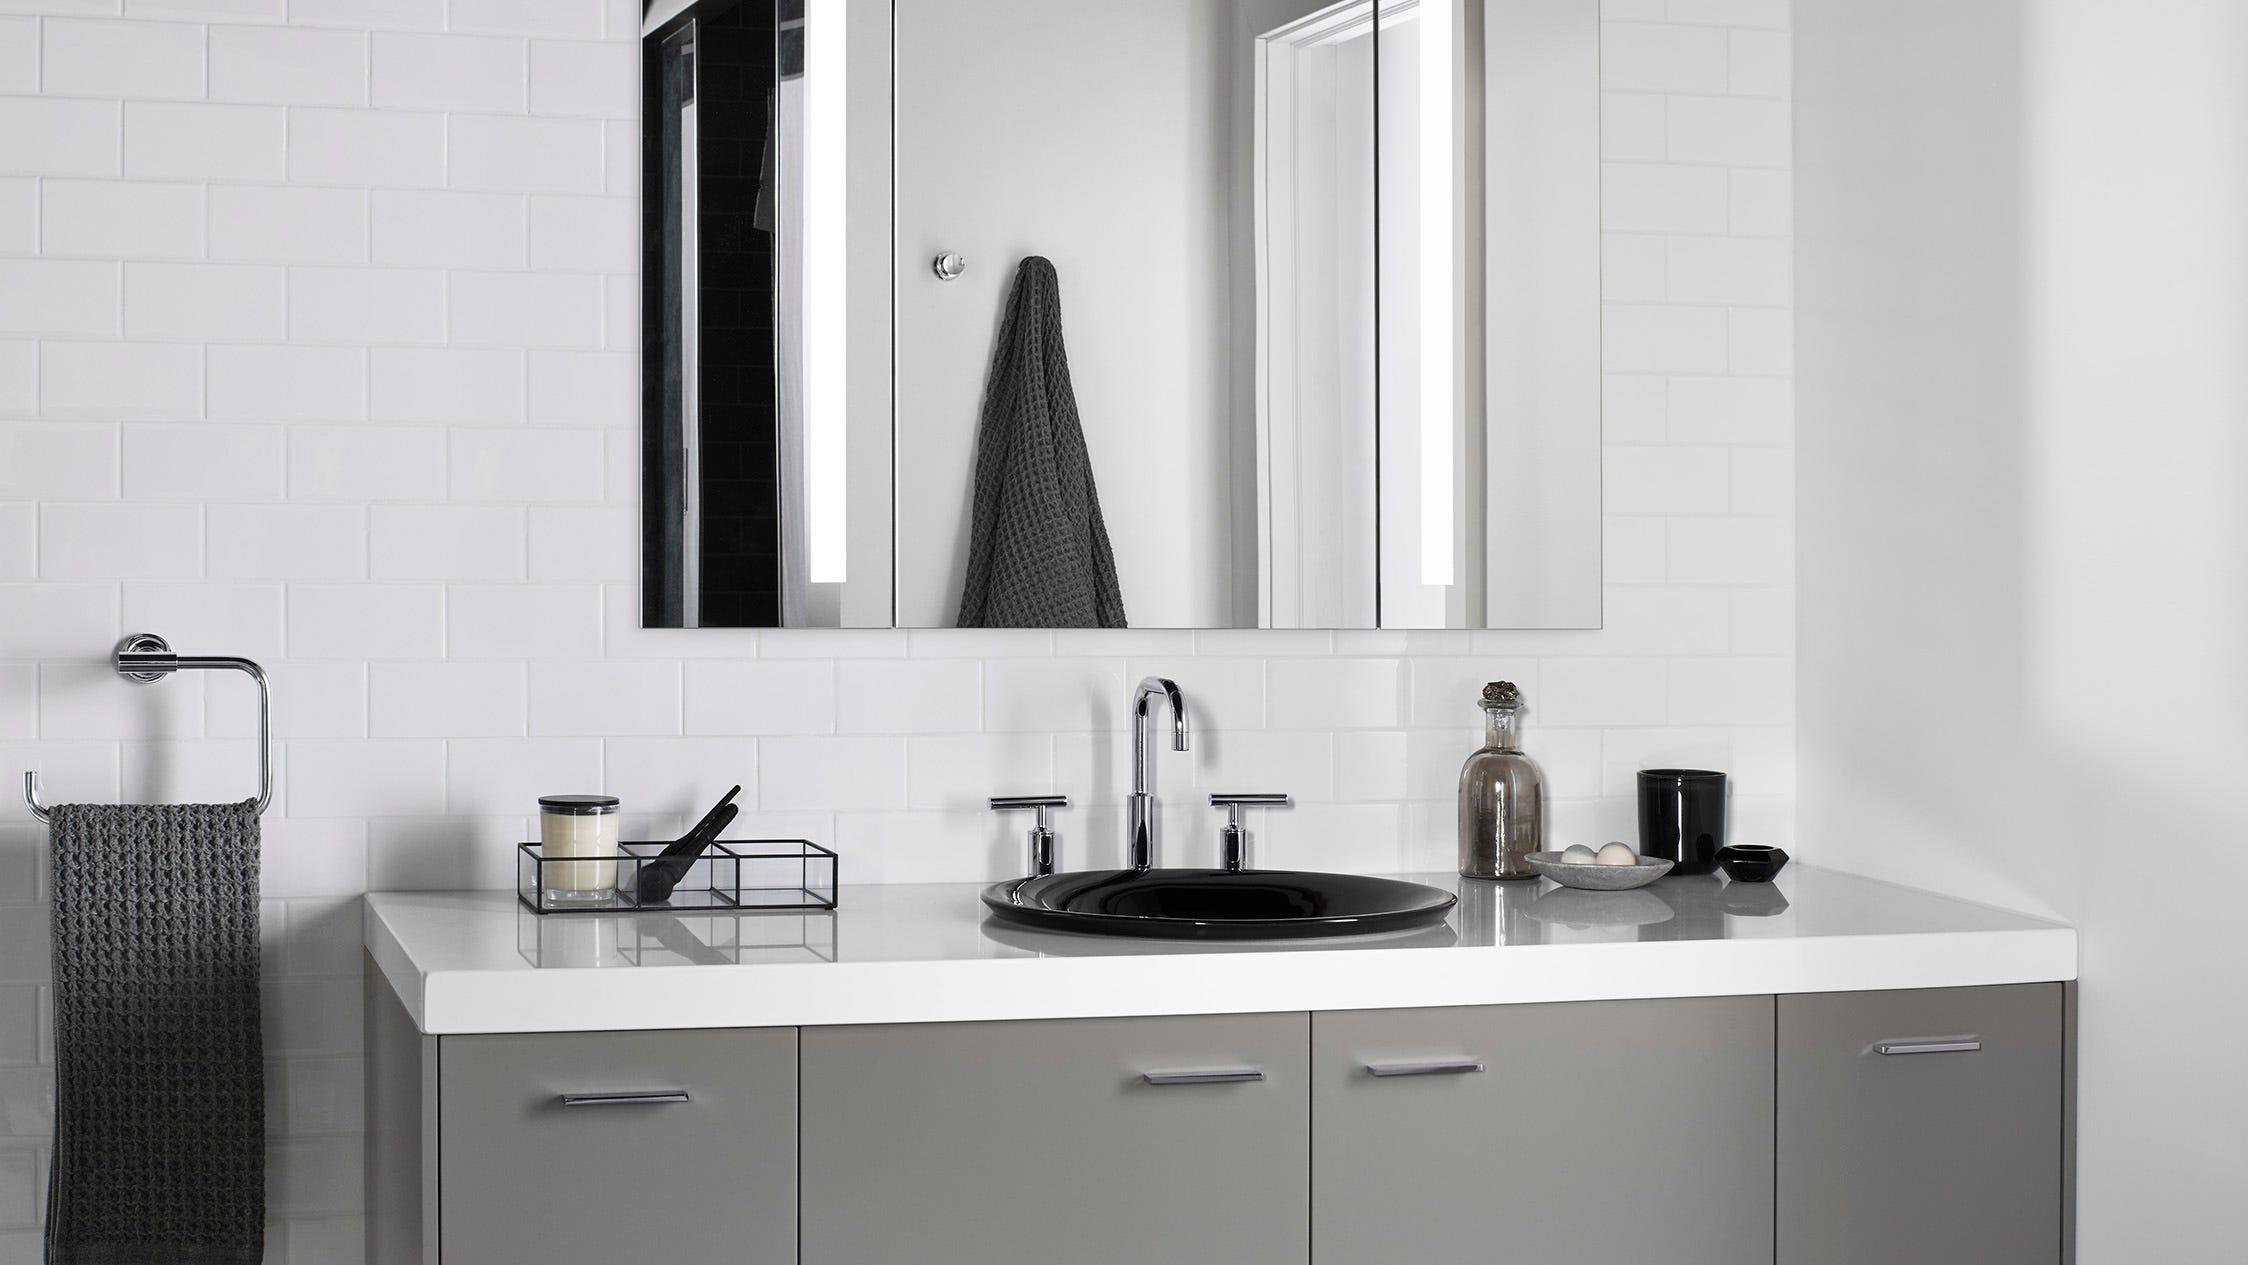 The Plumber Look Into A Modern Bathroom Mirror